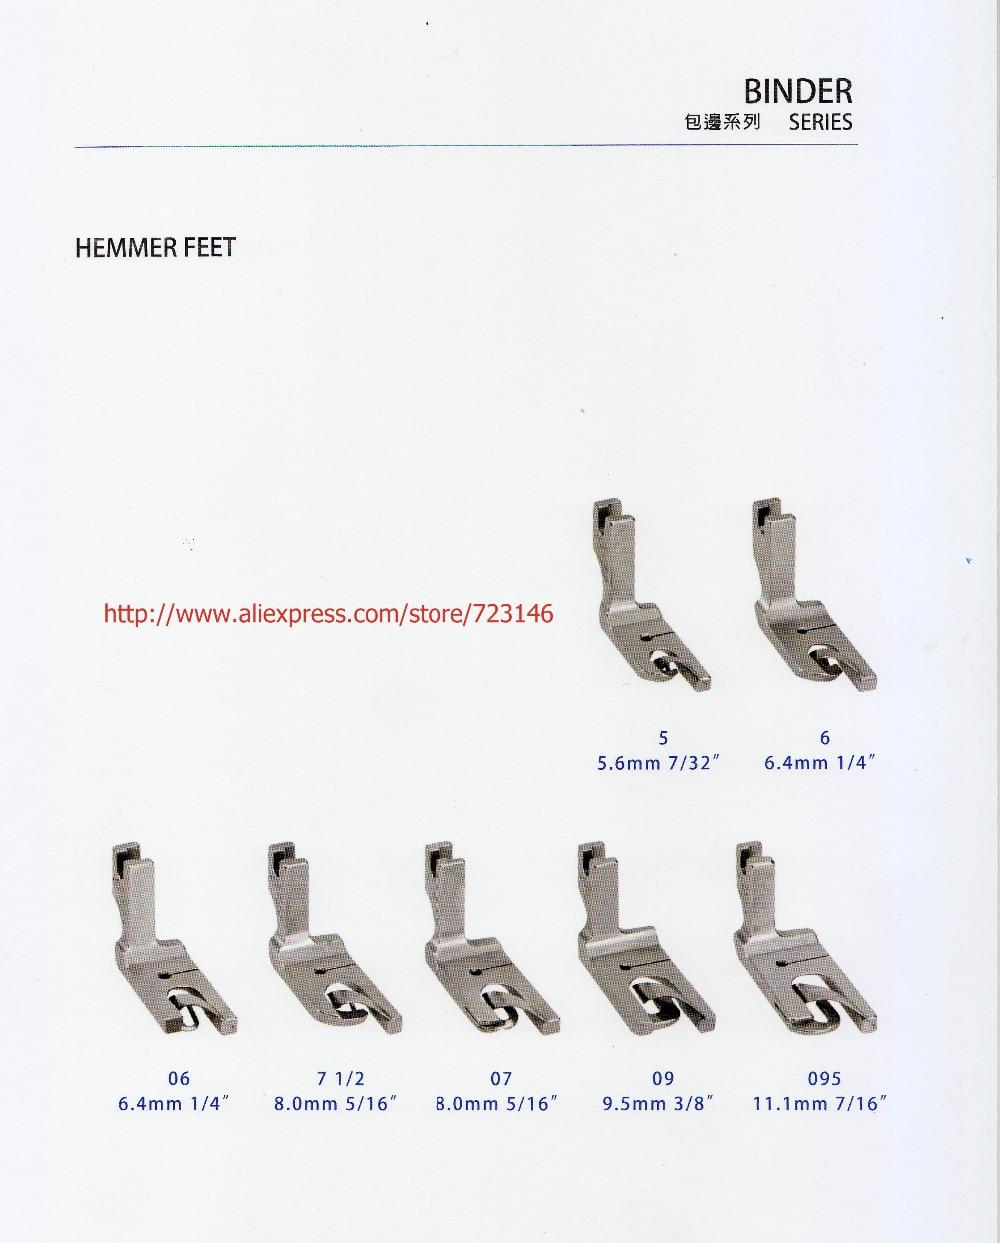 ᗑ】4 unids HEMMER PIES SERIE pespunte industrial máquina de coser ...